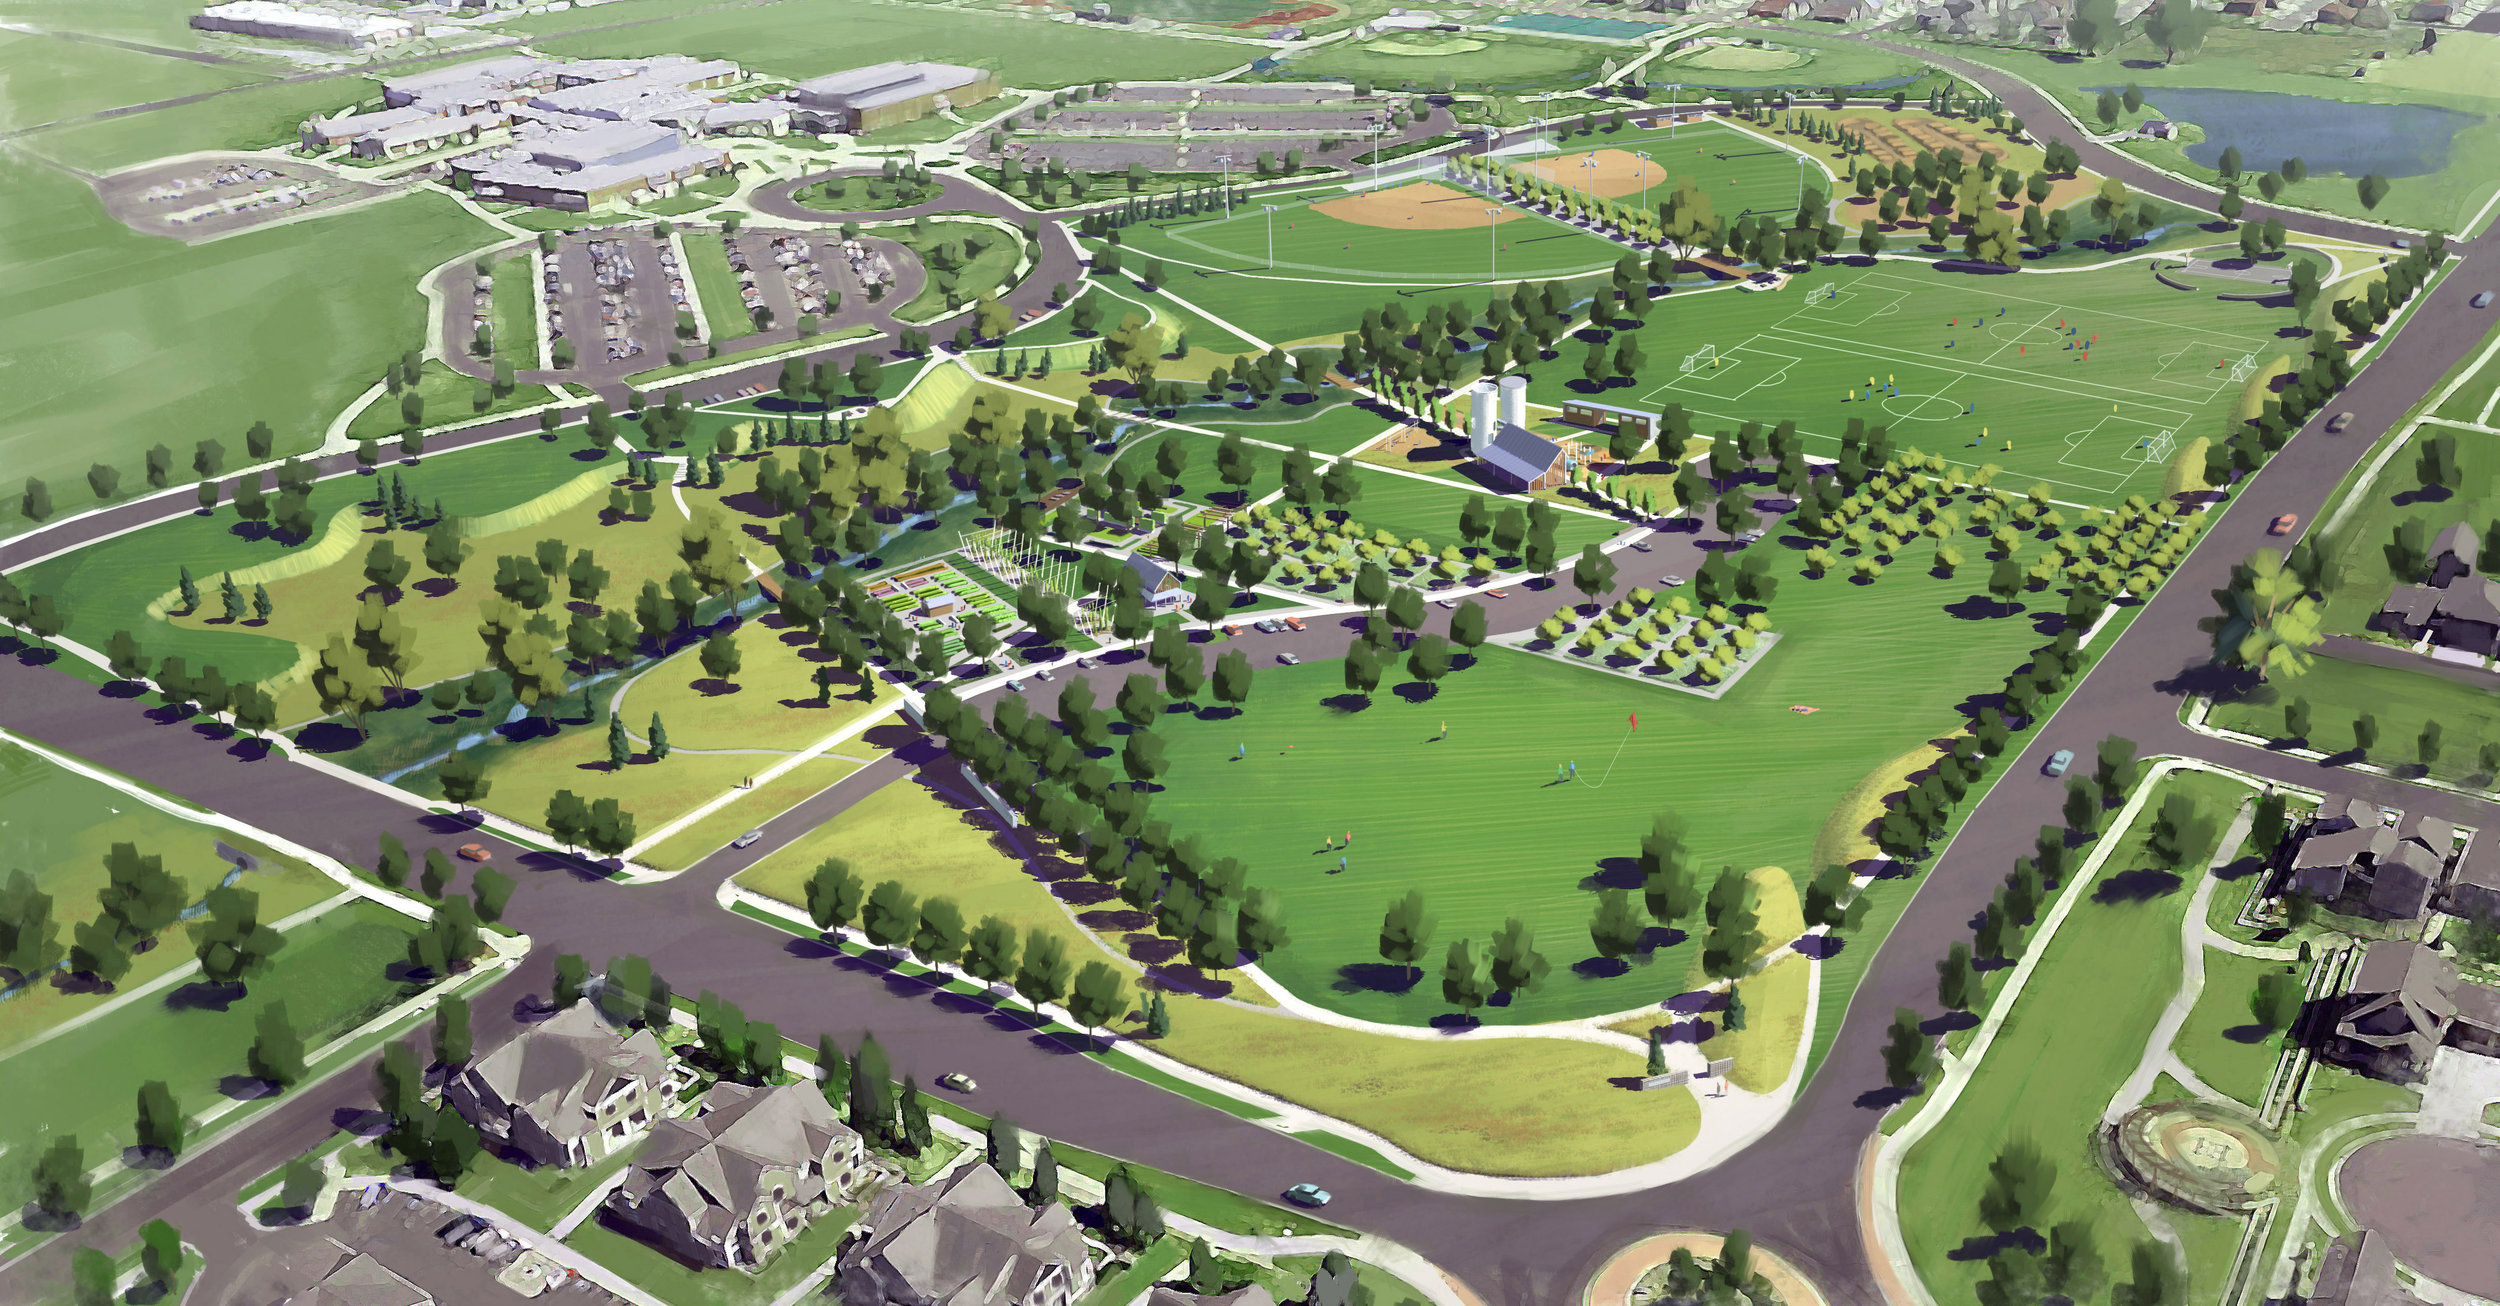 secp-aerial-view.jpg